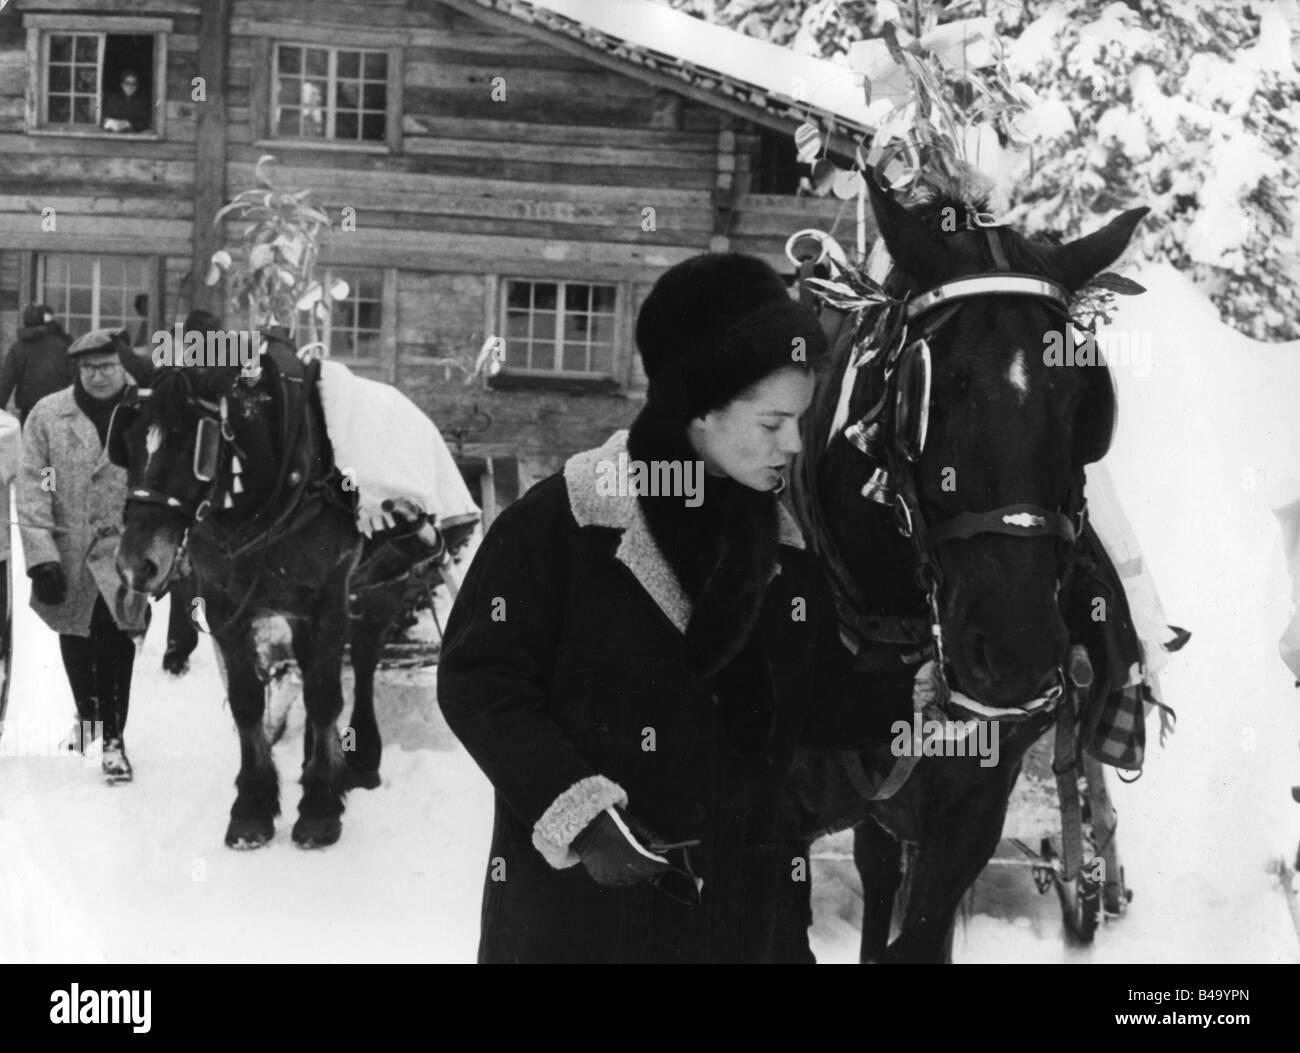 Schneider, Romy, 23.9.1938 - 29.5.1982, German actress, half length, standing beside horse, winter holidays, Megeve, Stock Photo